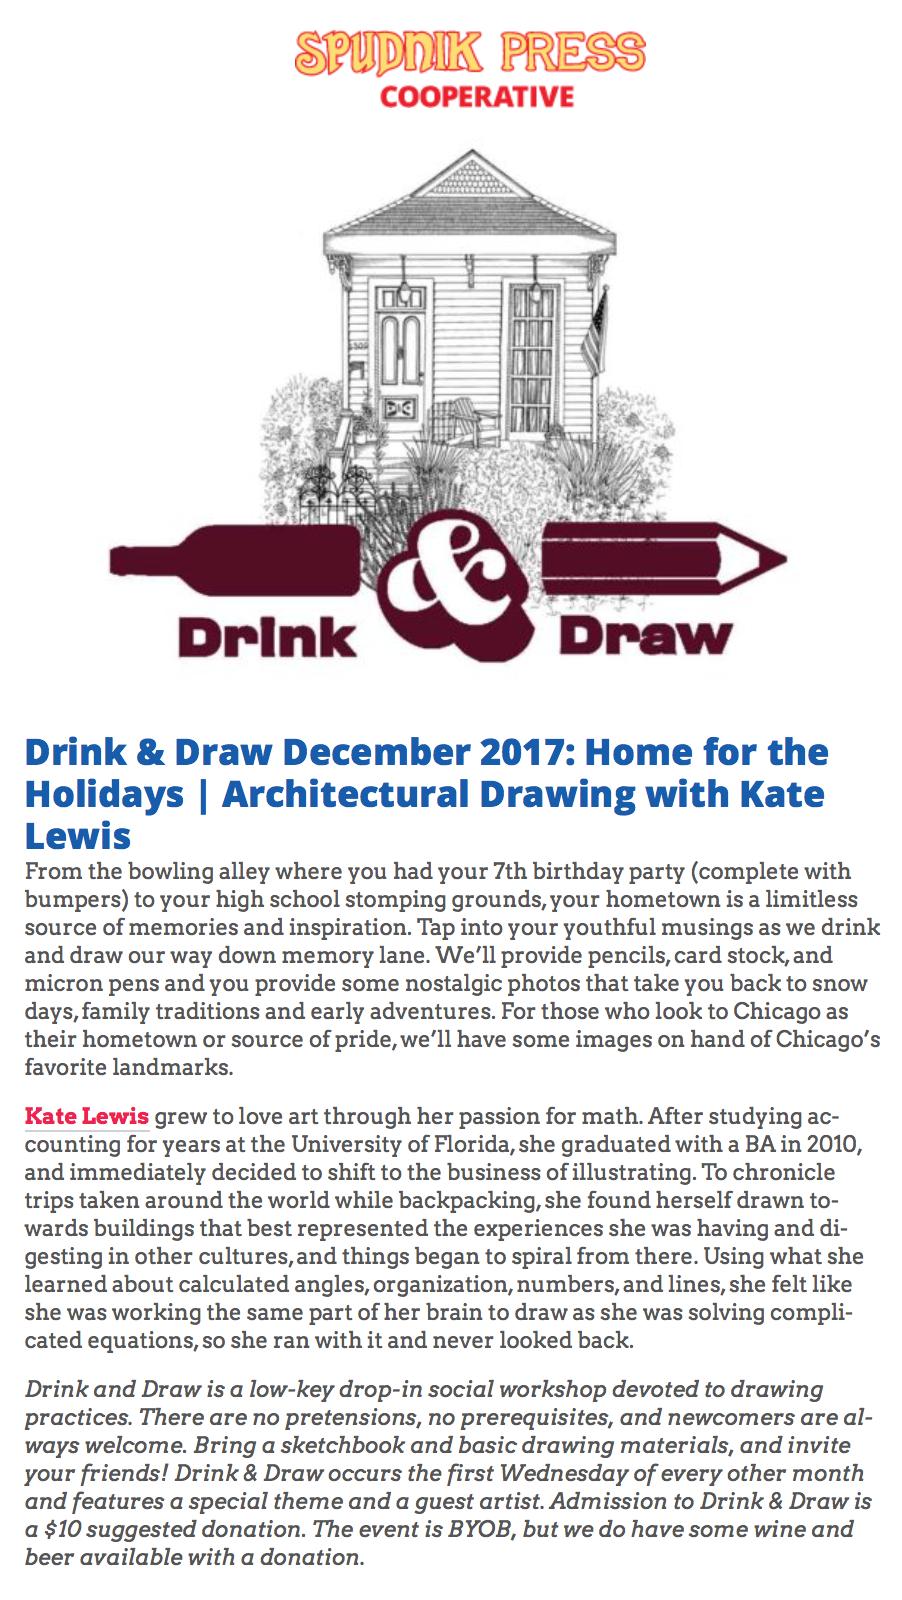 Spudnik Press Drink & Draw with Kate Lewis